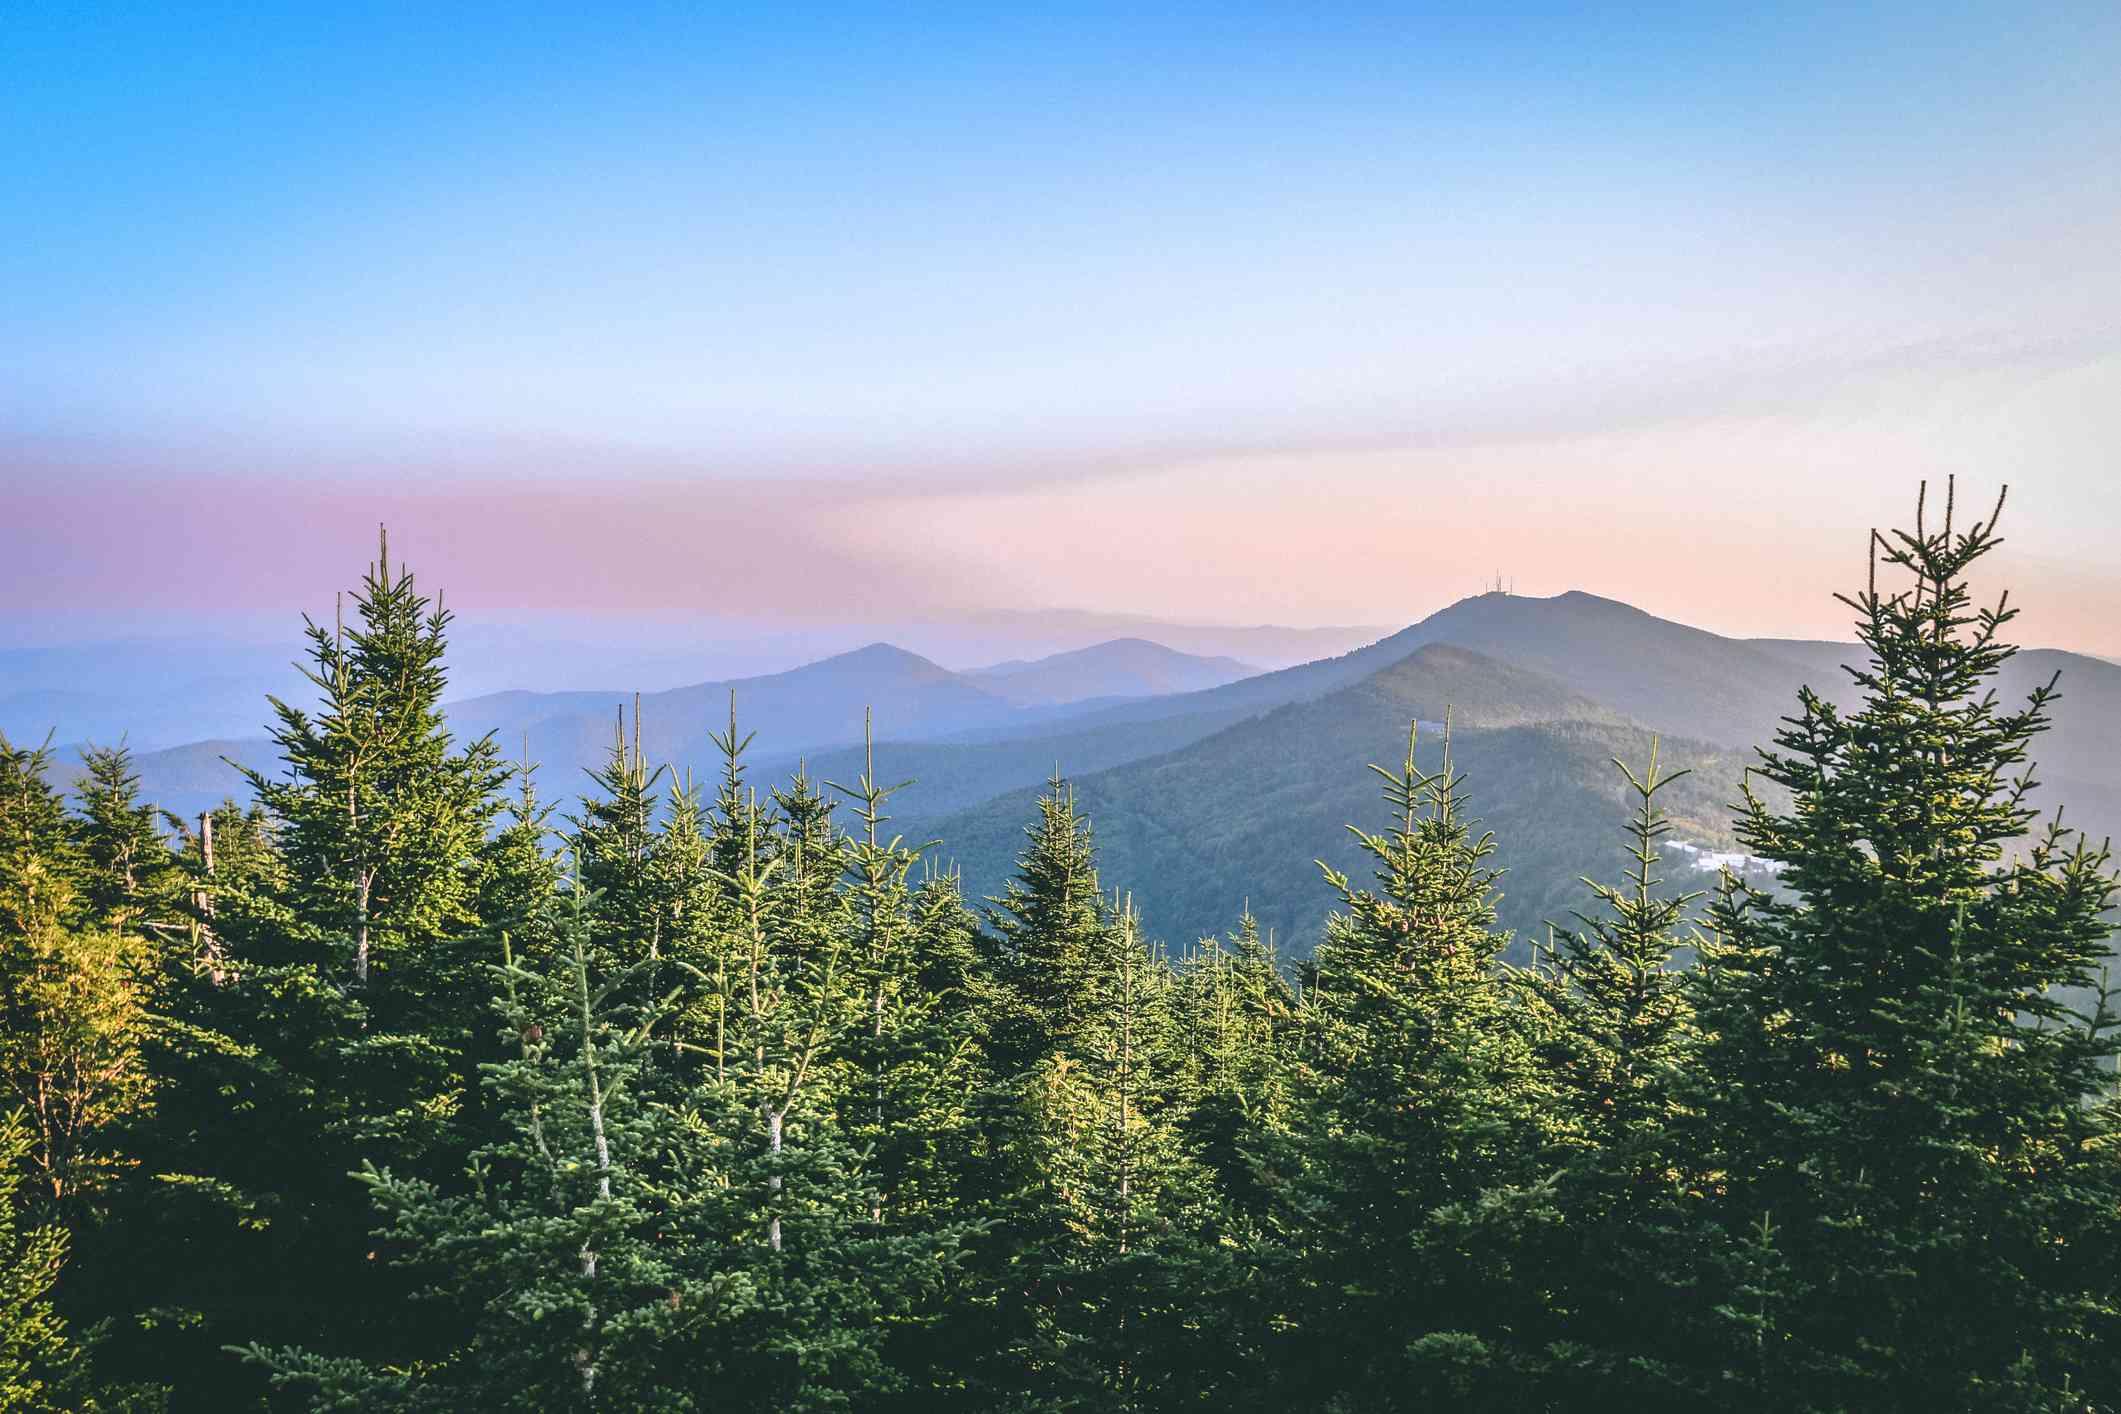 Mount Mitchell near Asheville, North Carolina